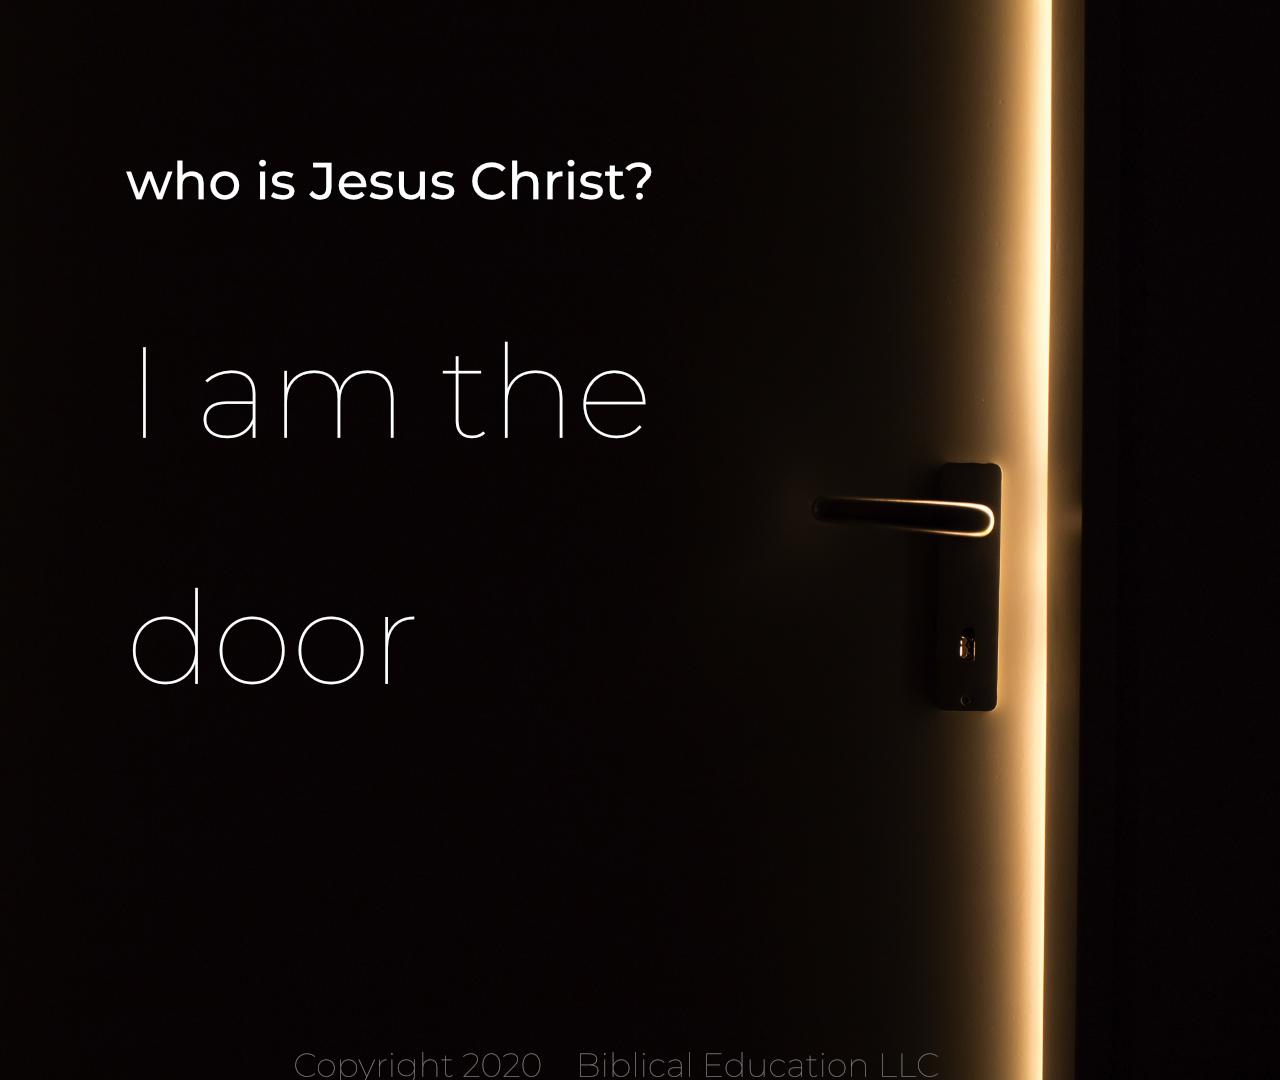 Je suis la porte 1280x1080